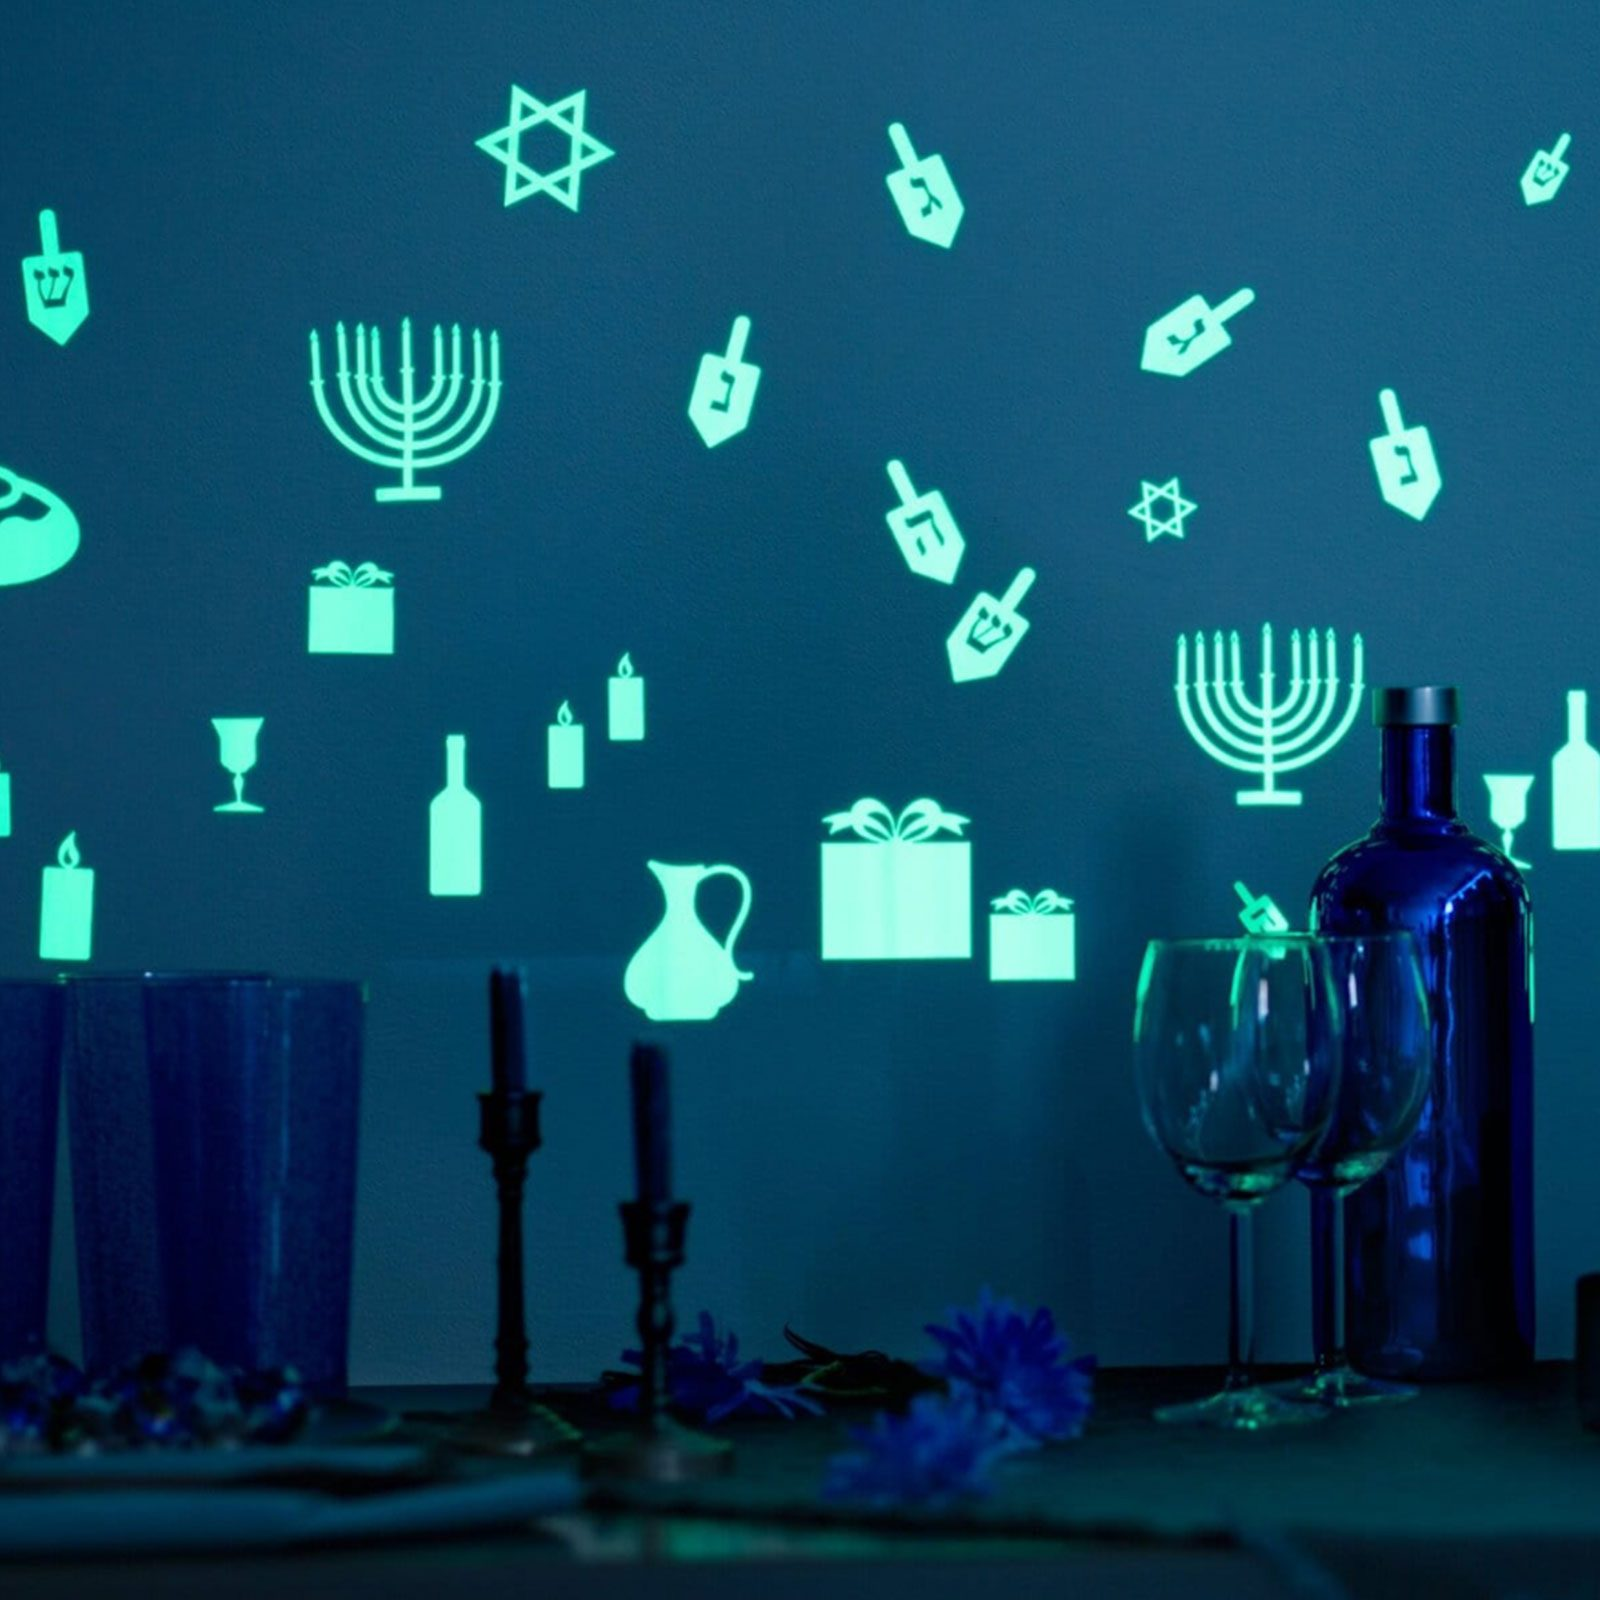 Glow-in-the-Dark Hanukkah Wall Decals